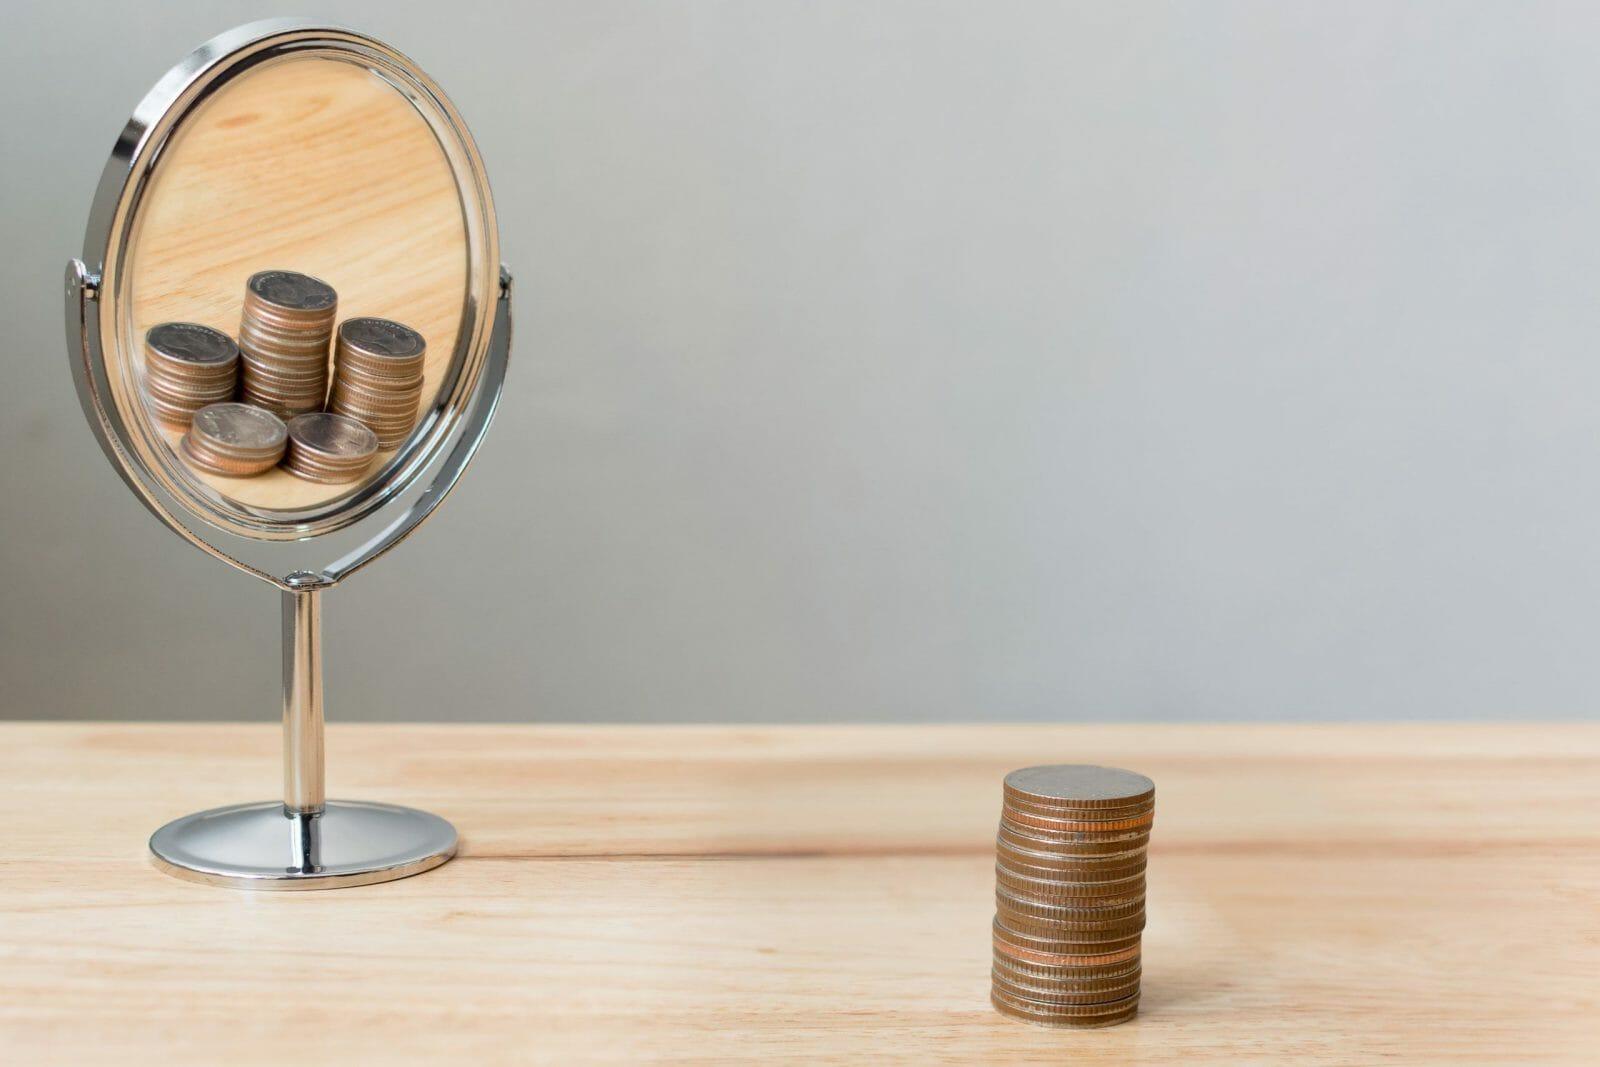 Money mirror reflection, Save money investment concept